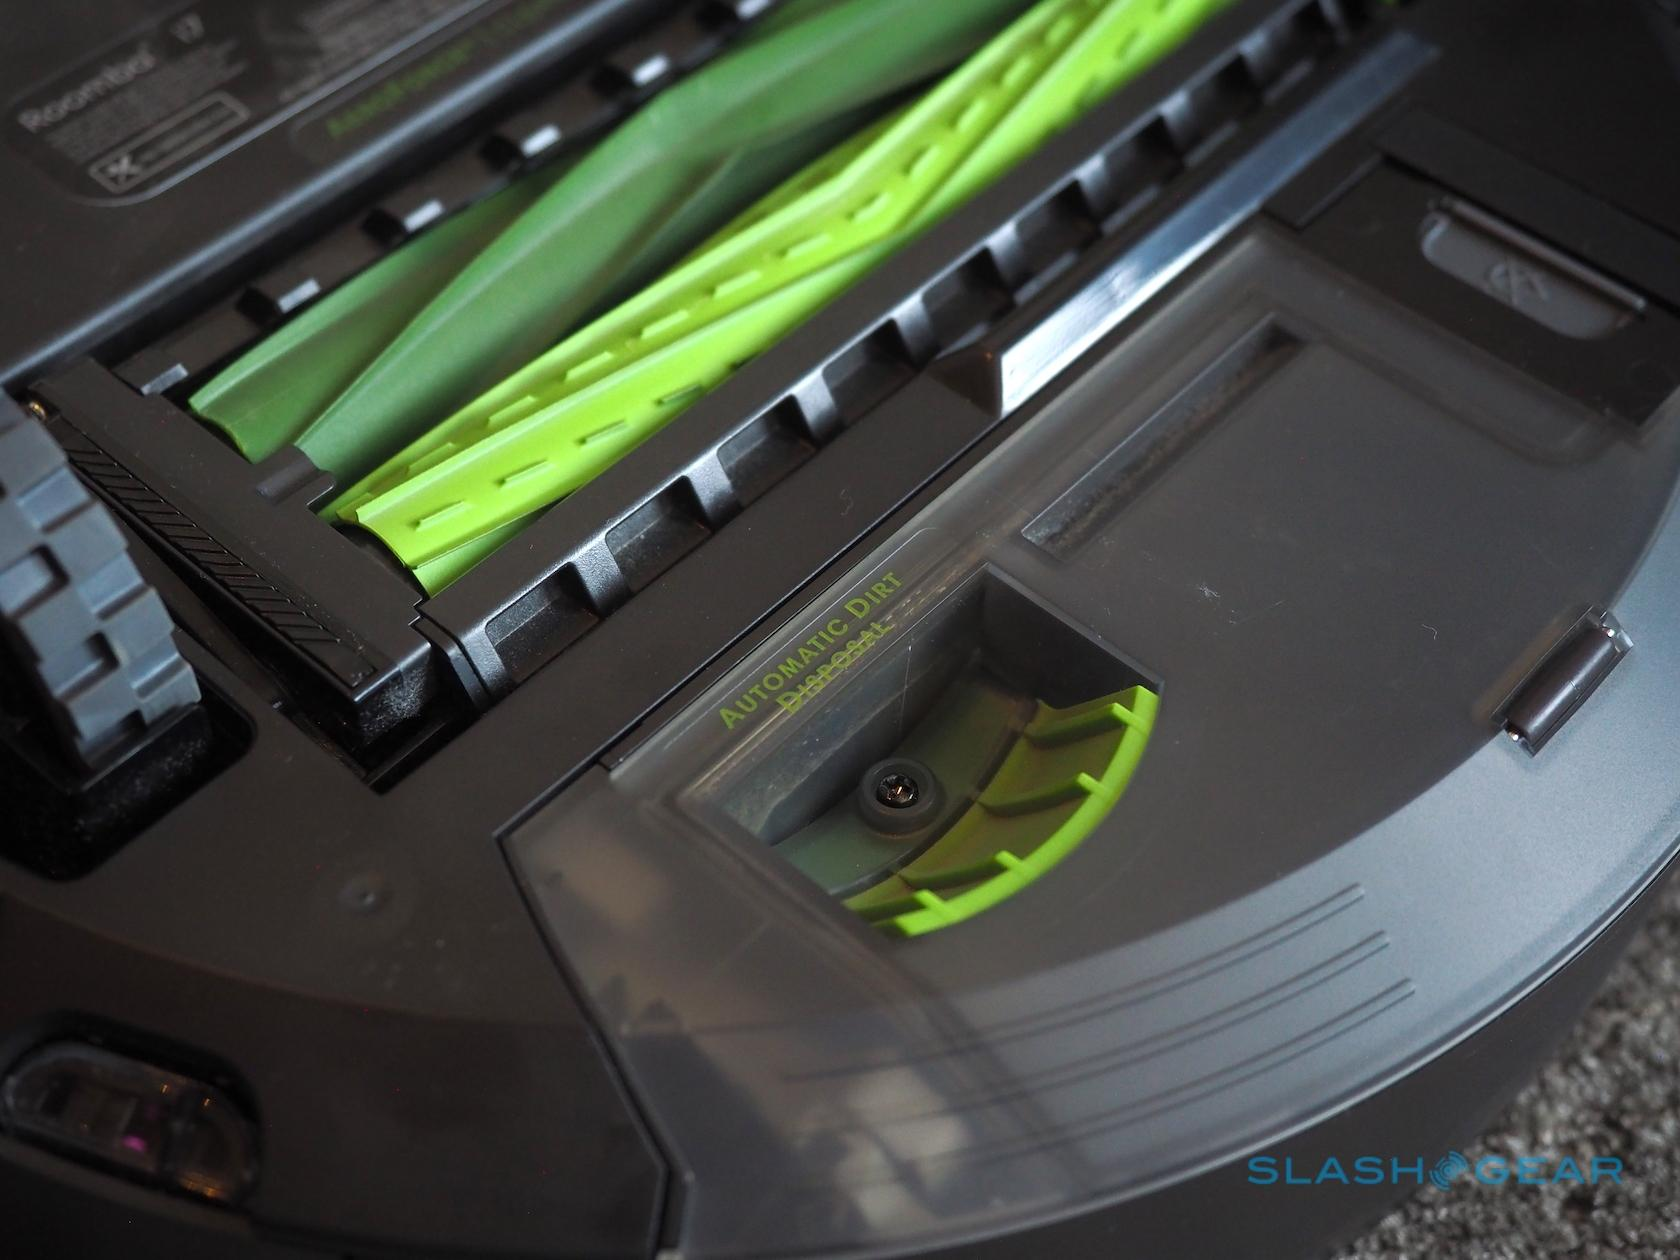 iRobot's self-emptying Roomba i7+ fixes robot vacuums' big headache